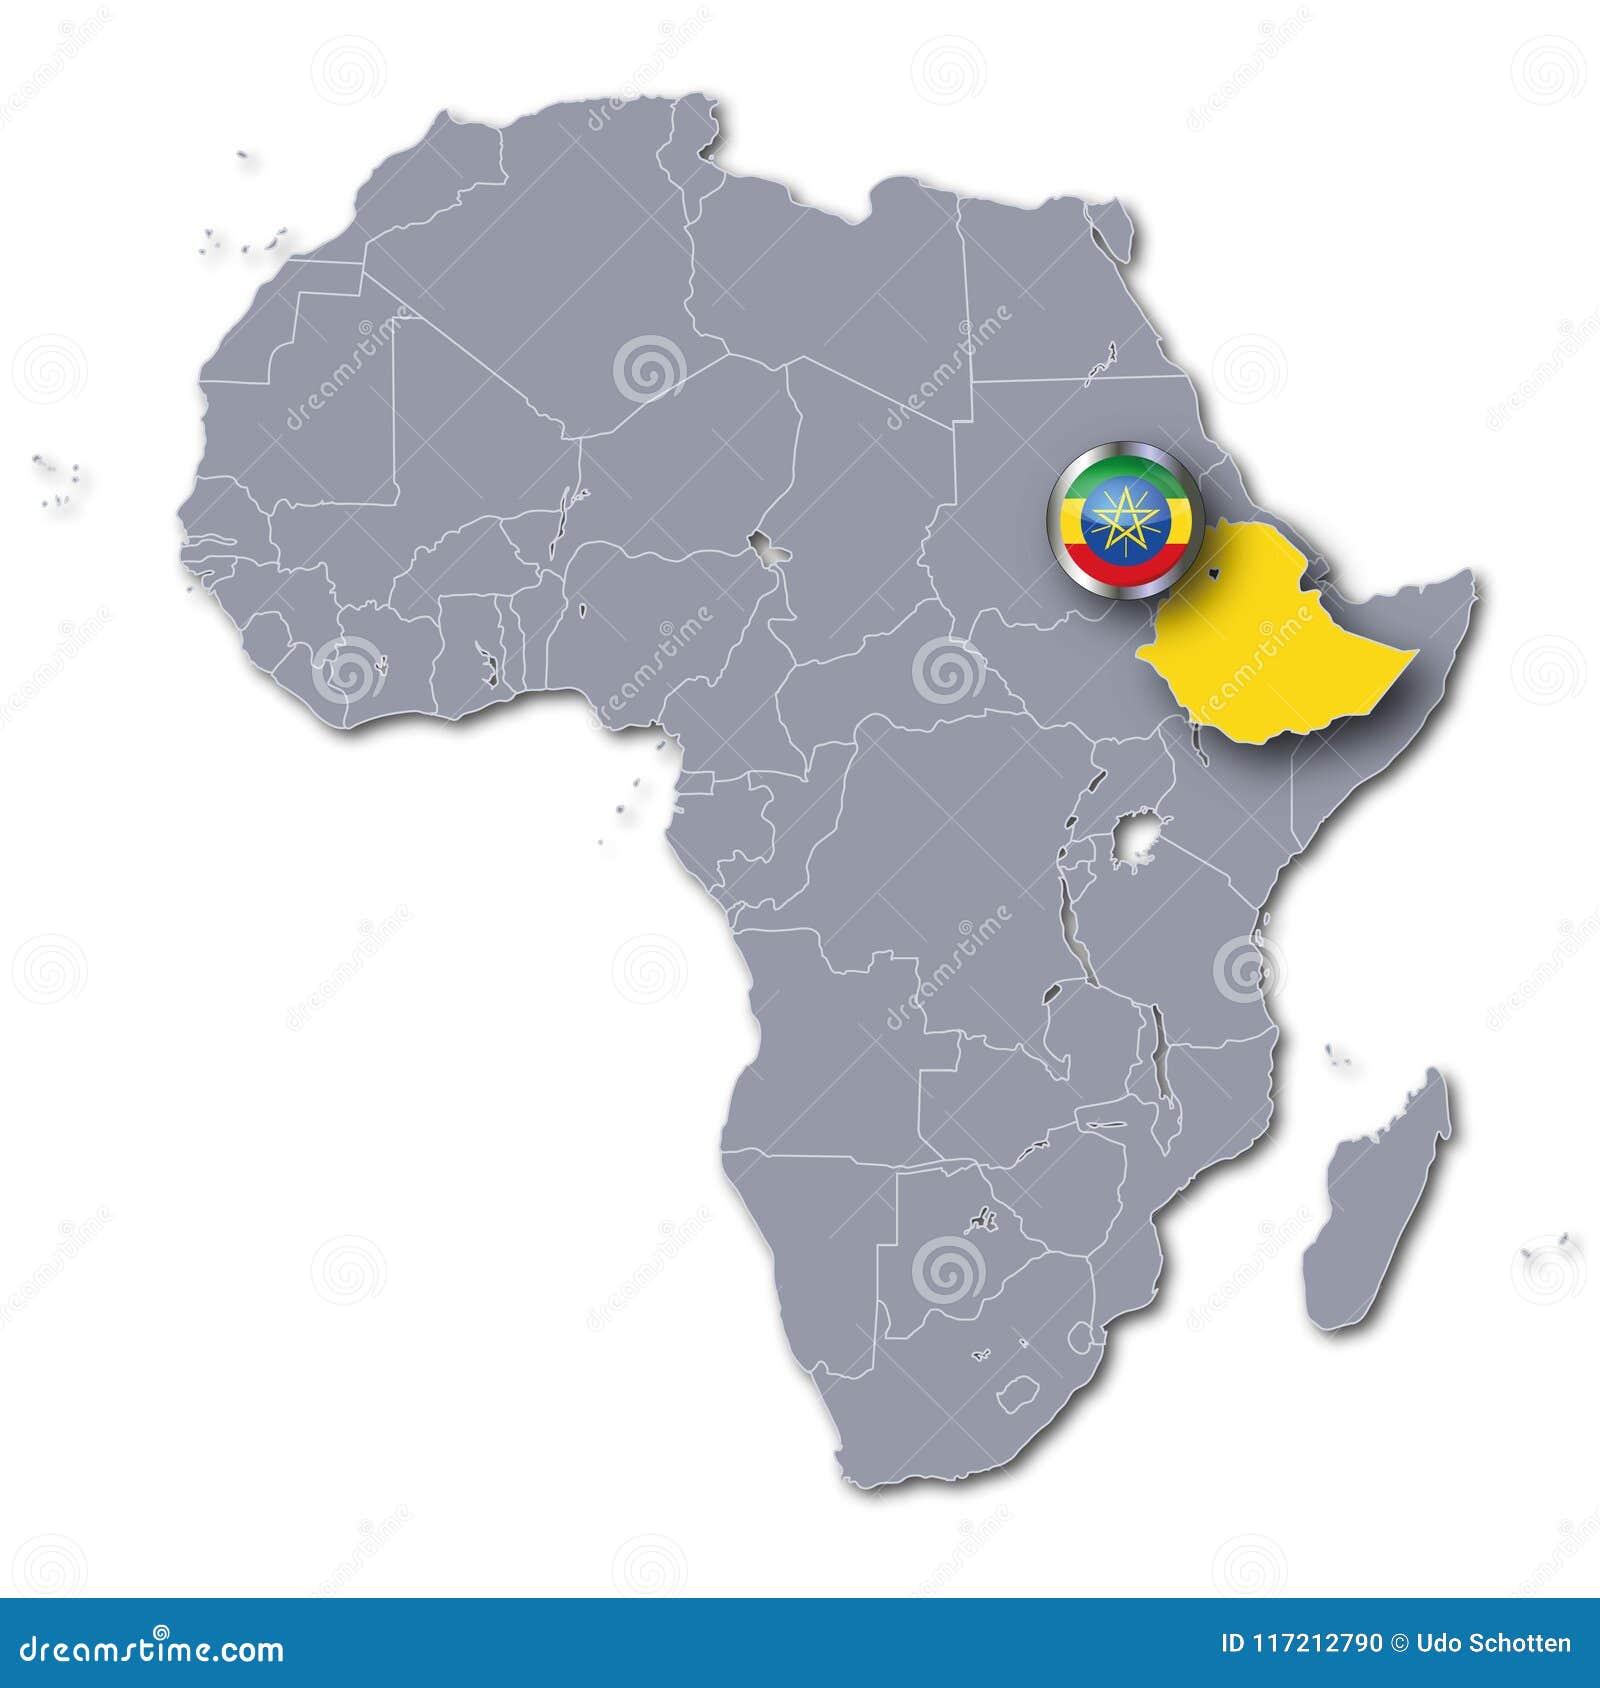 Africa map with ethiopia stock illustration illustration of voting download africa map with ethiopia stock illustration illustration of voting 117212790 gumiabroncs Choice Image